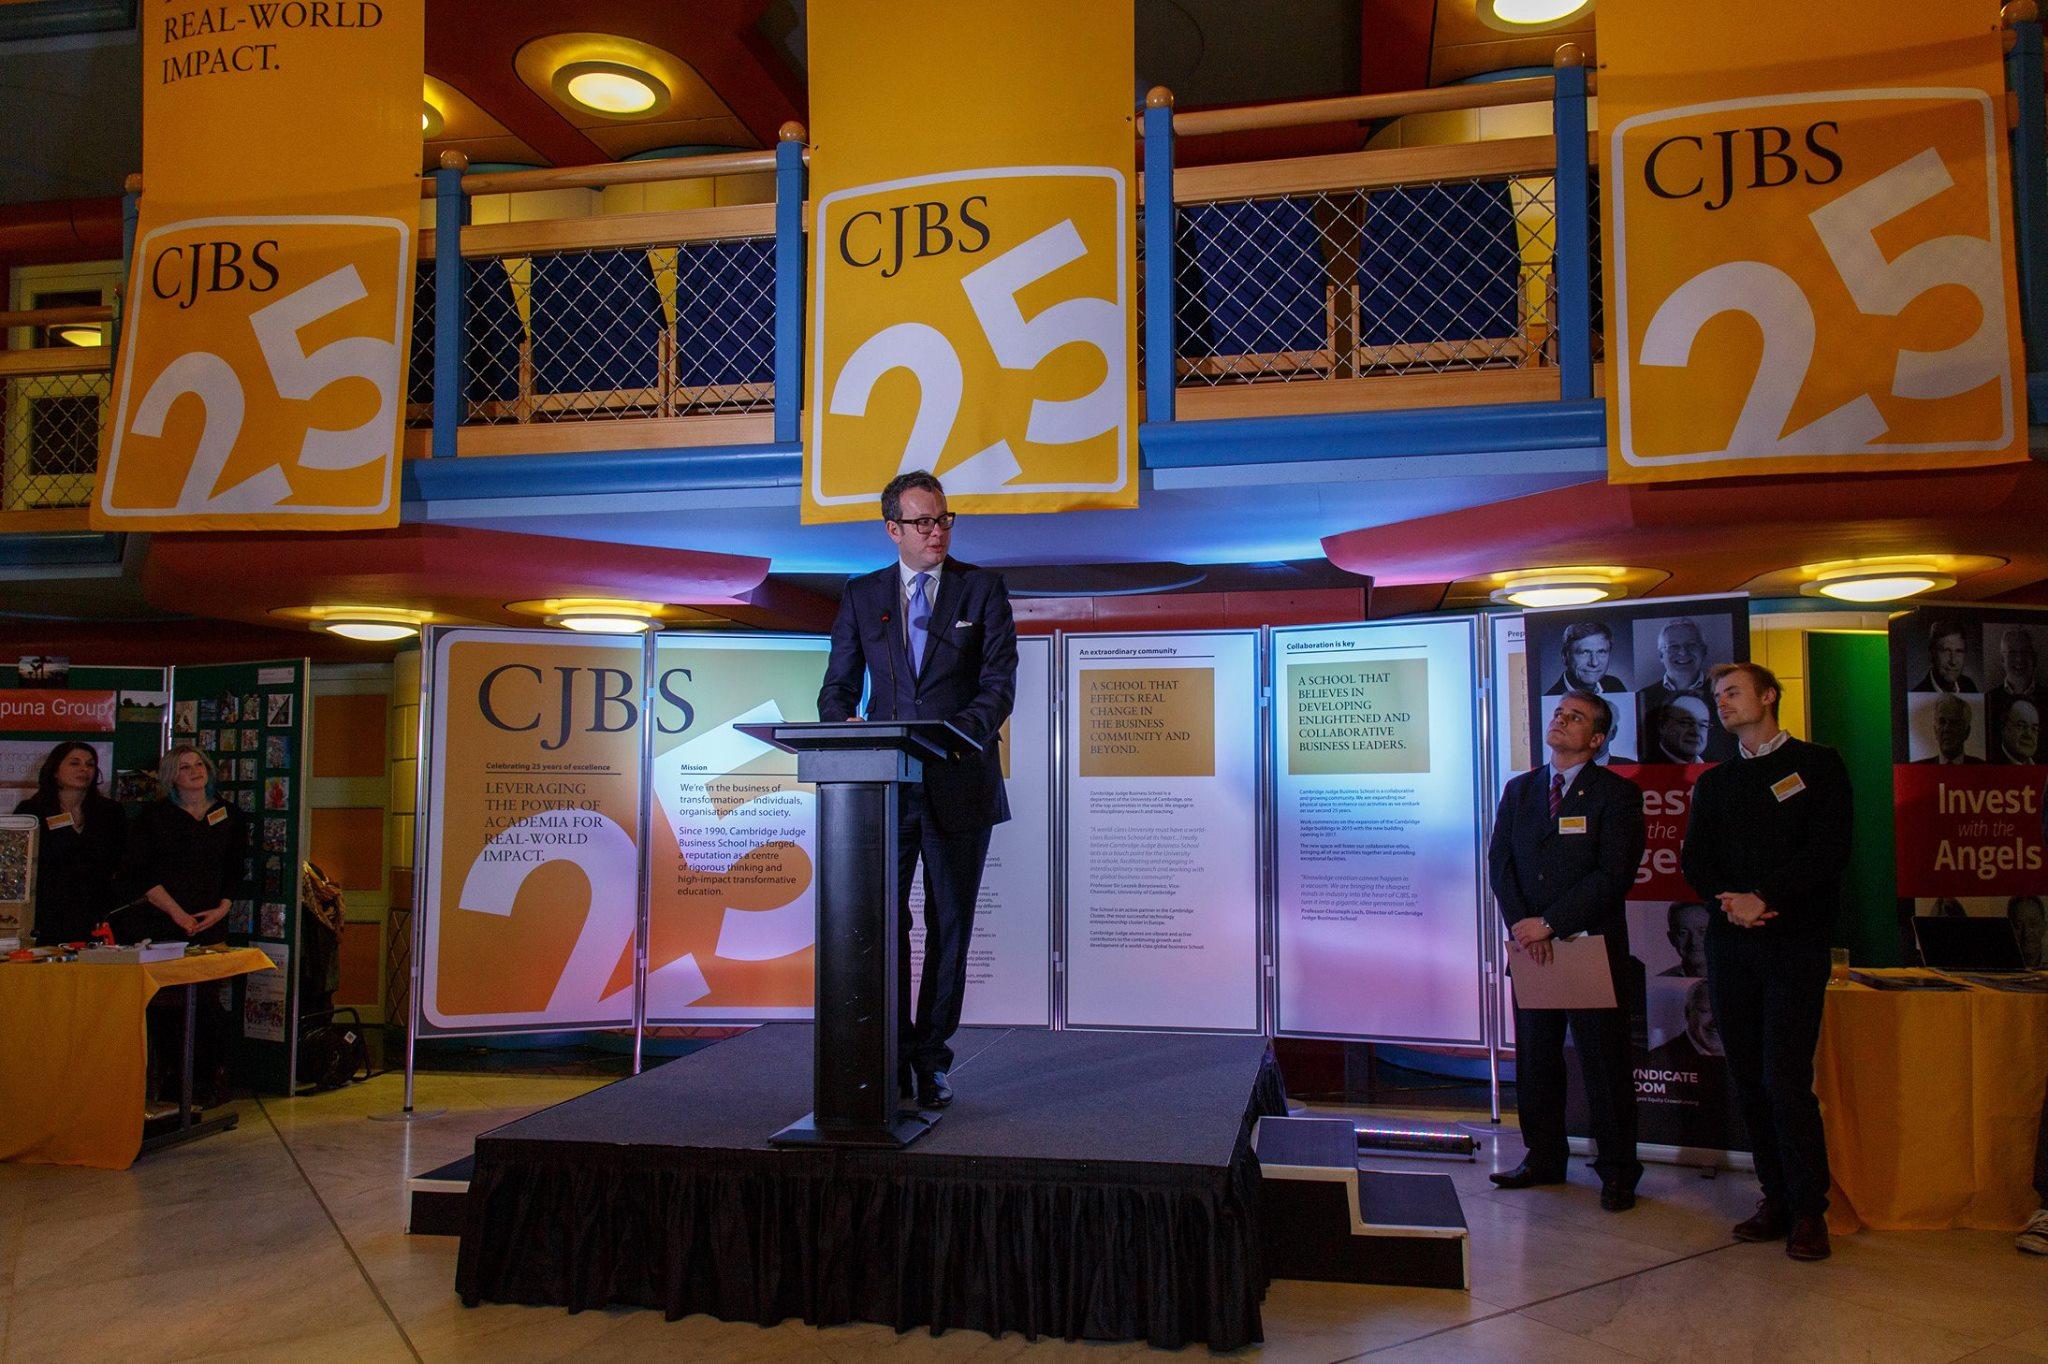 Michael Hayman, CJBS